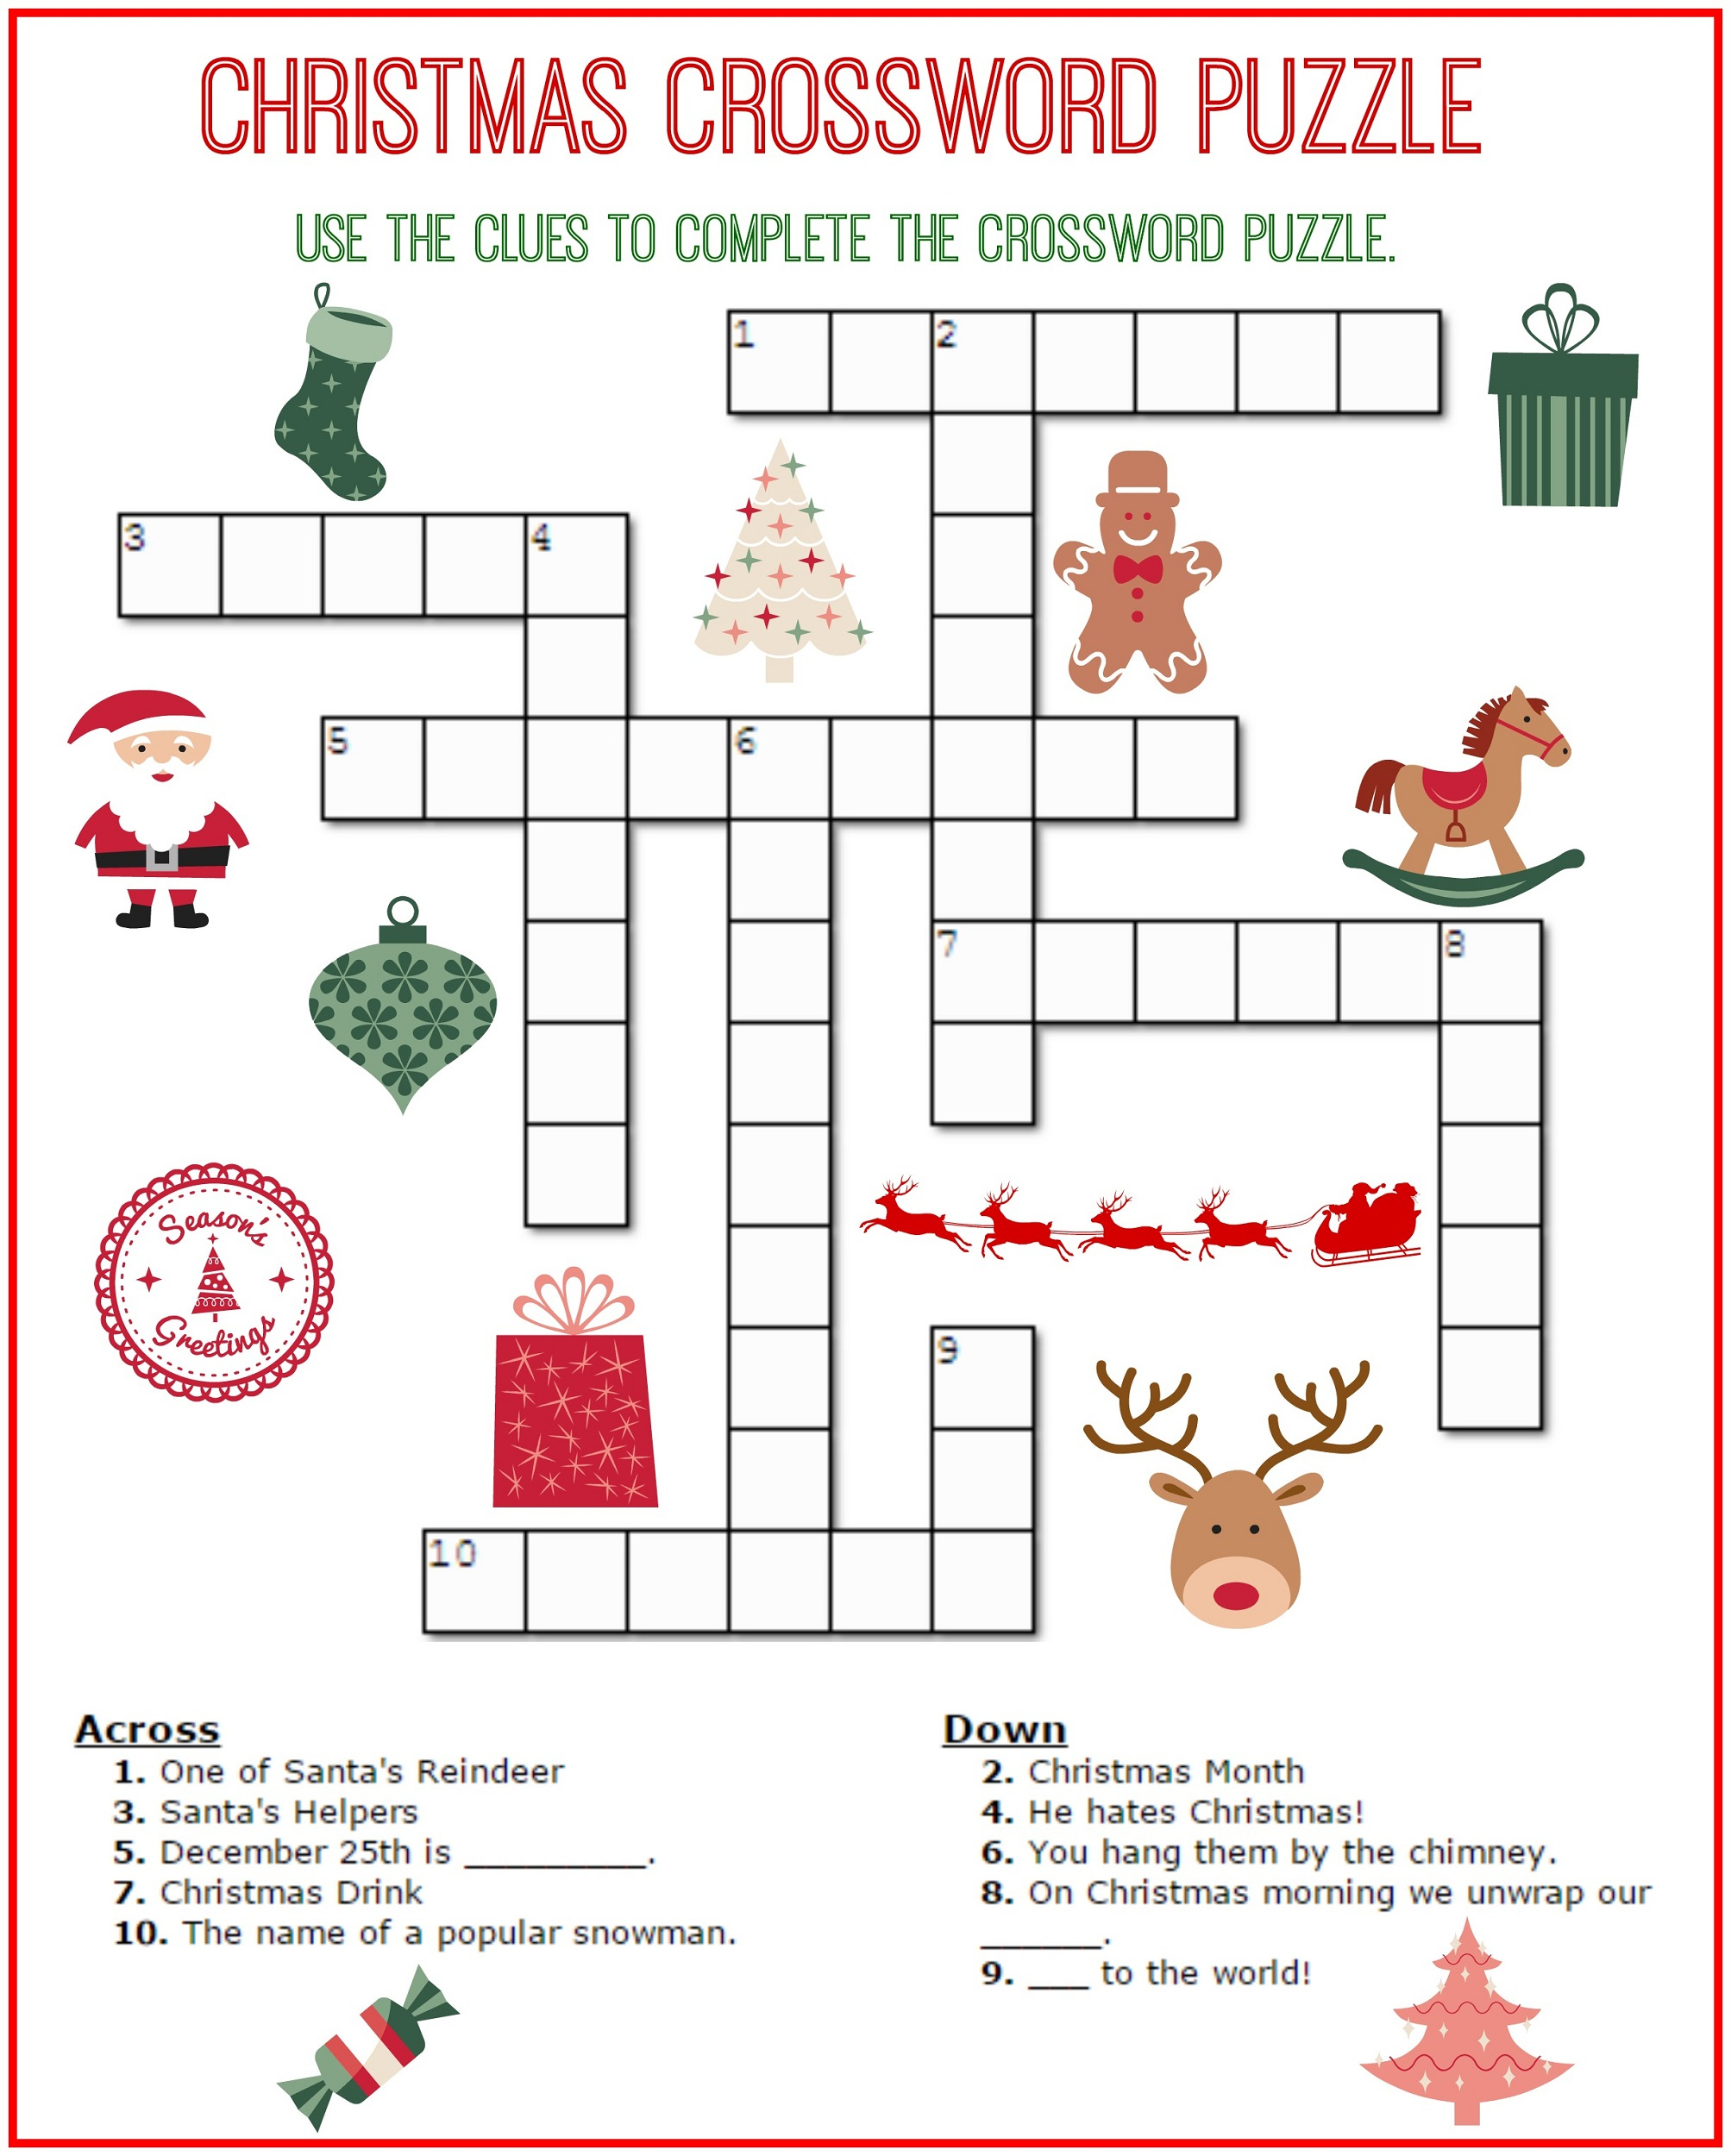 Crossword Puzzle Kids Printable 2017   Kiddo Shelter - Free Easy - Printable Crossword Puzzles For Students